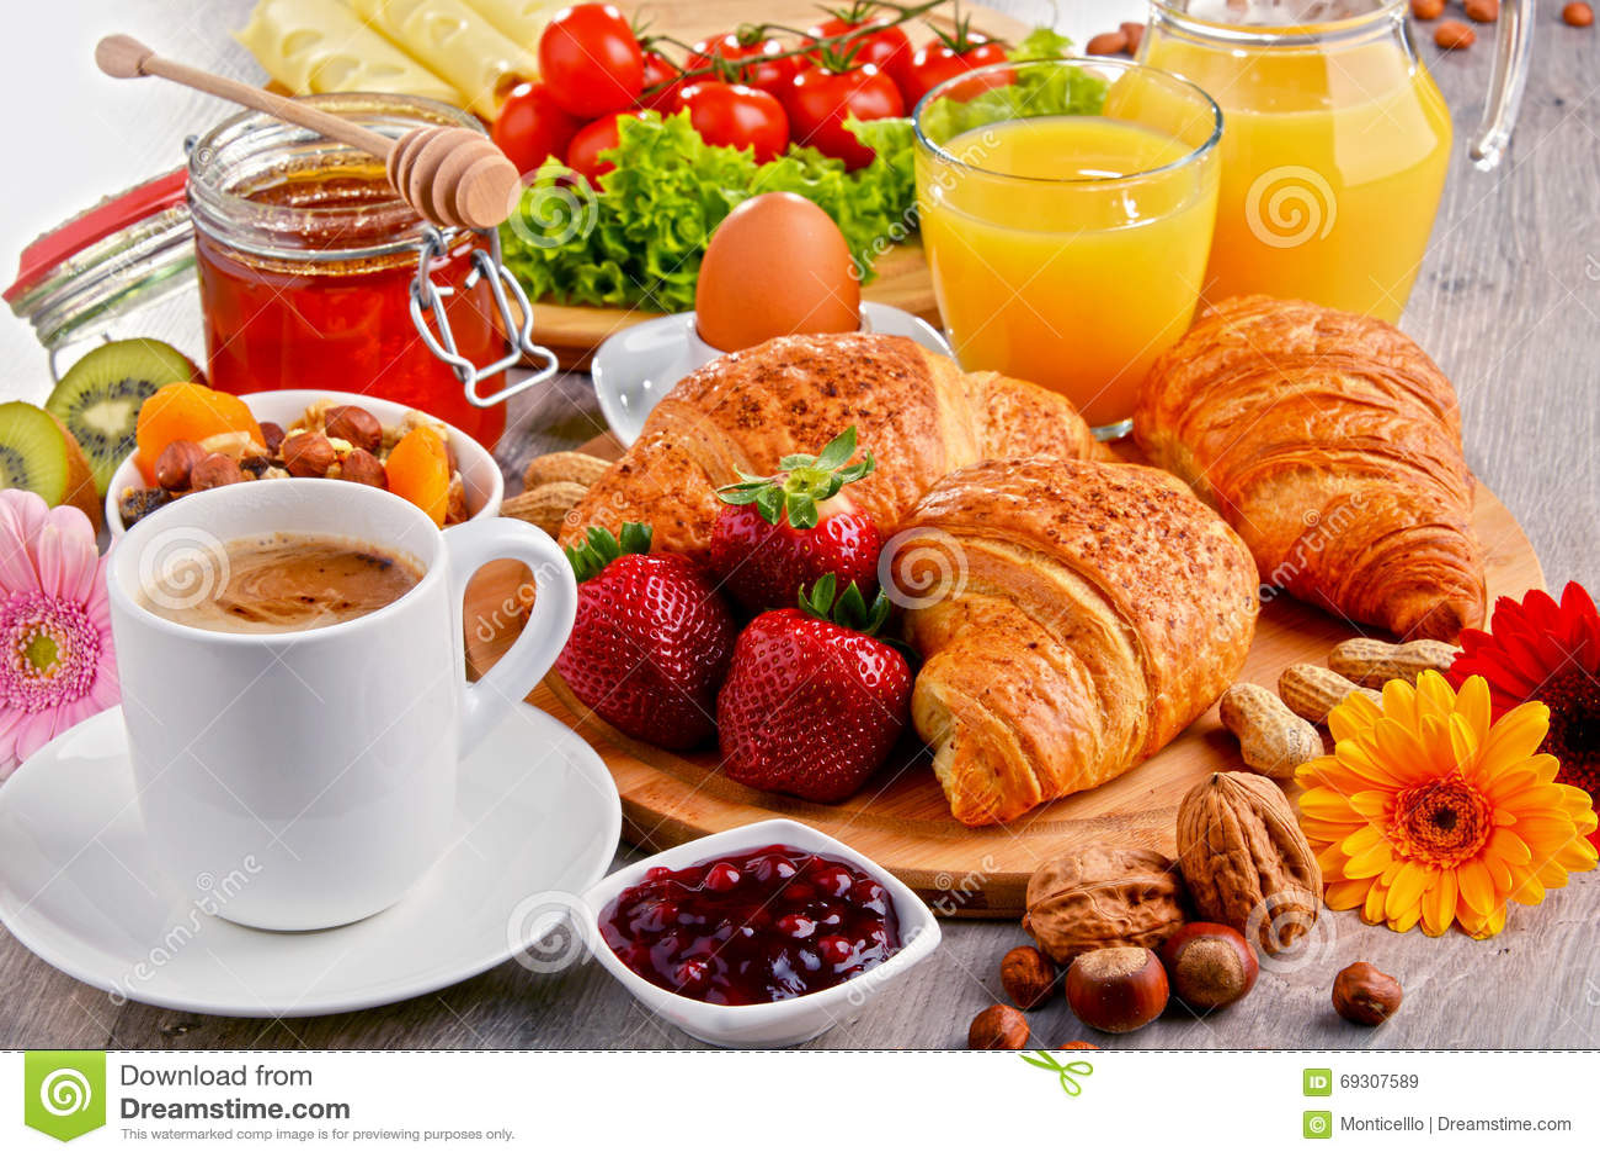 petit d jeuner se composant des croissants caf fruits jus d 39 orange image stock image du. Black Bedroom Furniture Sets. Home Design Ideas